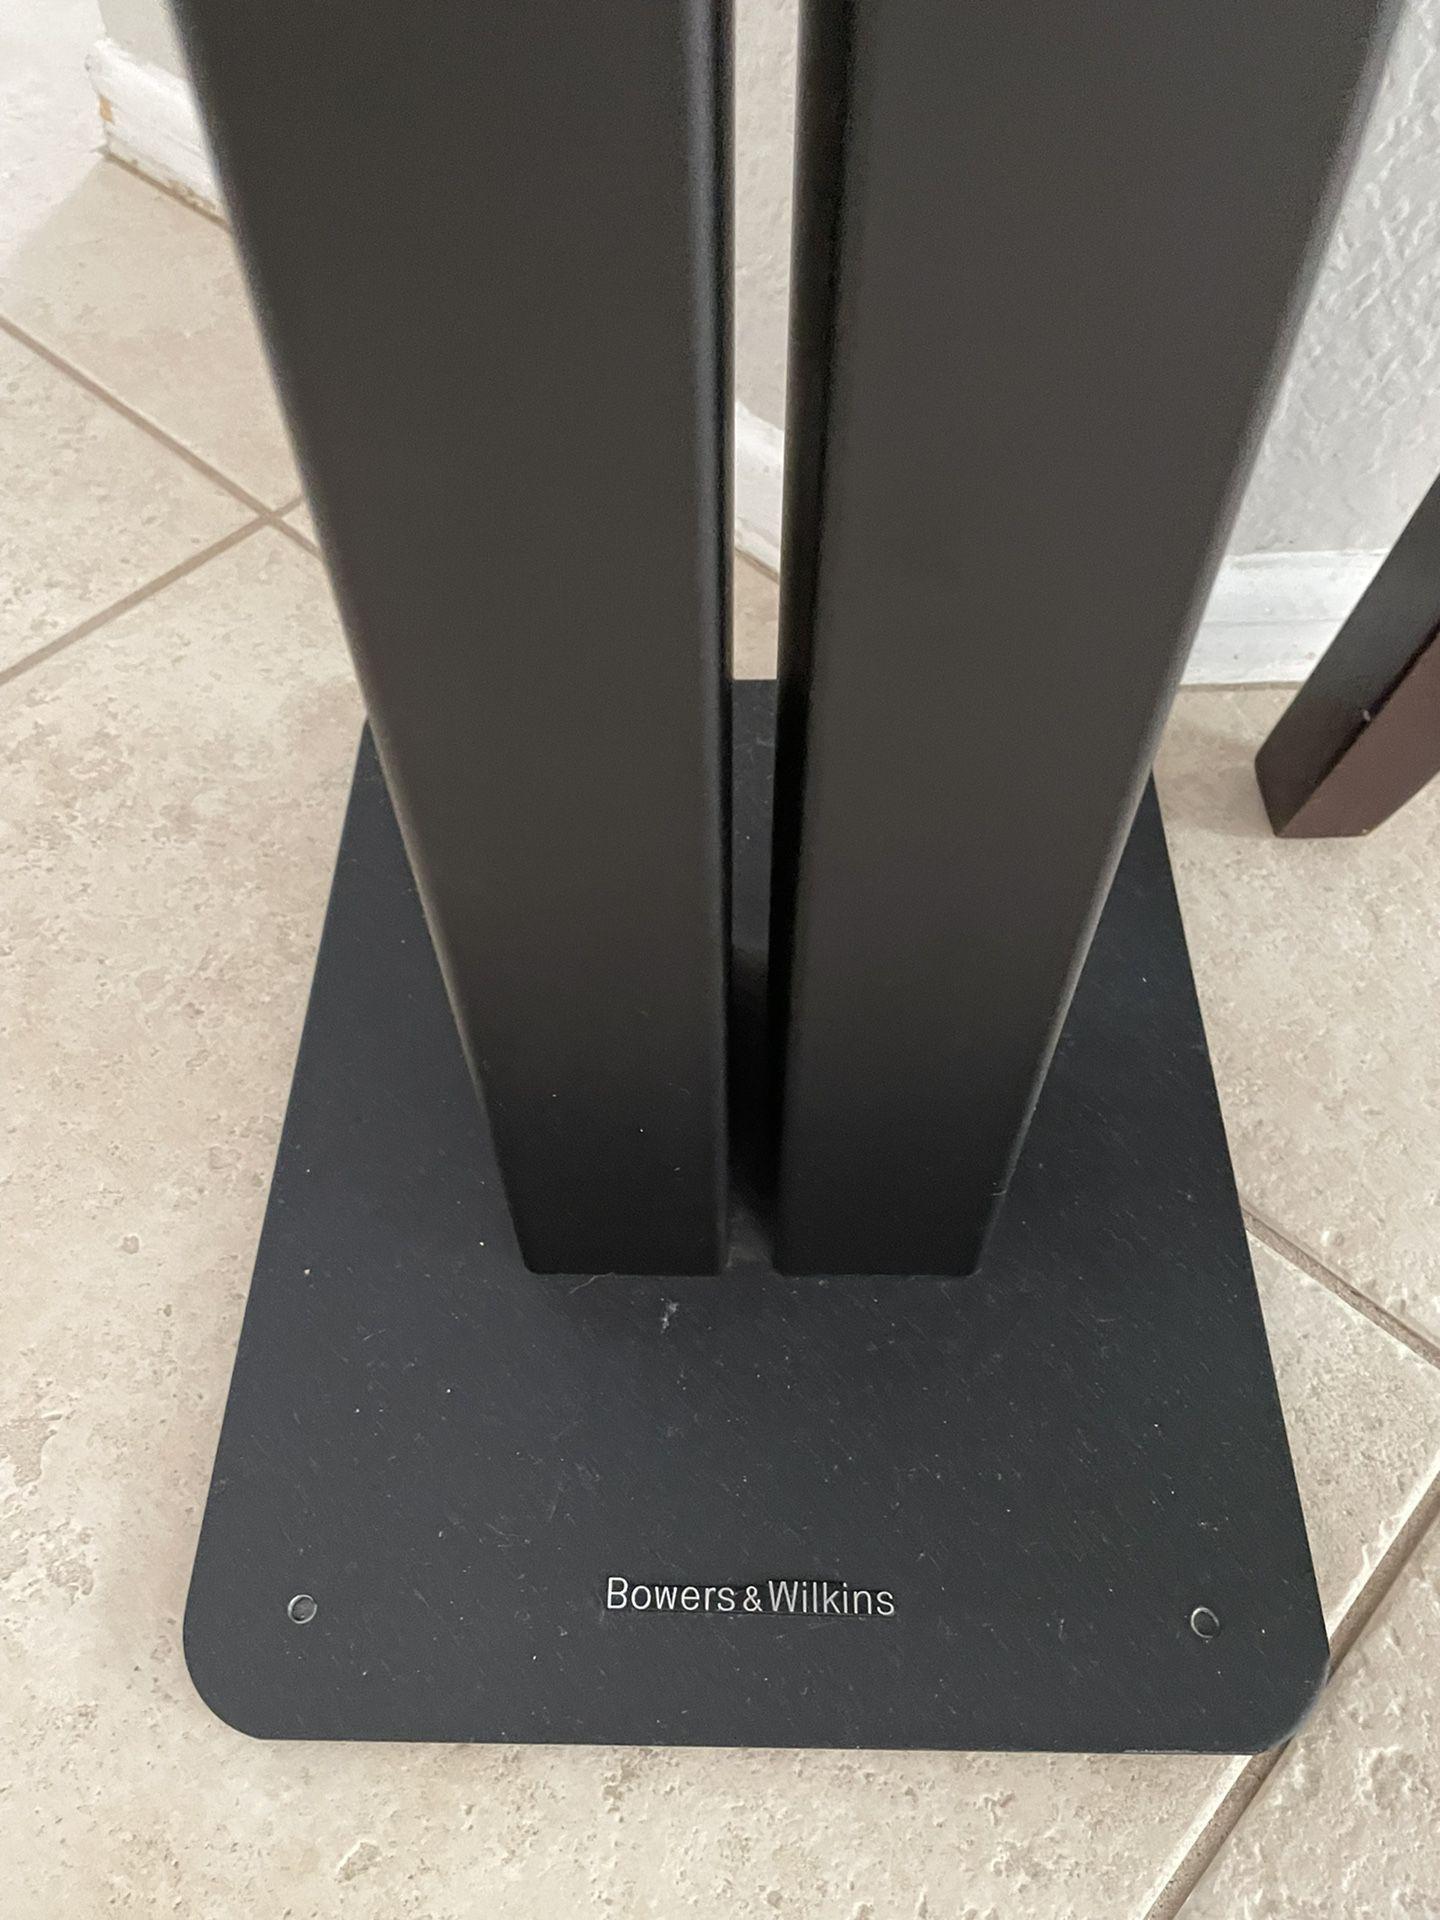 Marantz Stereo Receiver And Monitor Audio Speaker Set Up